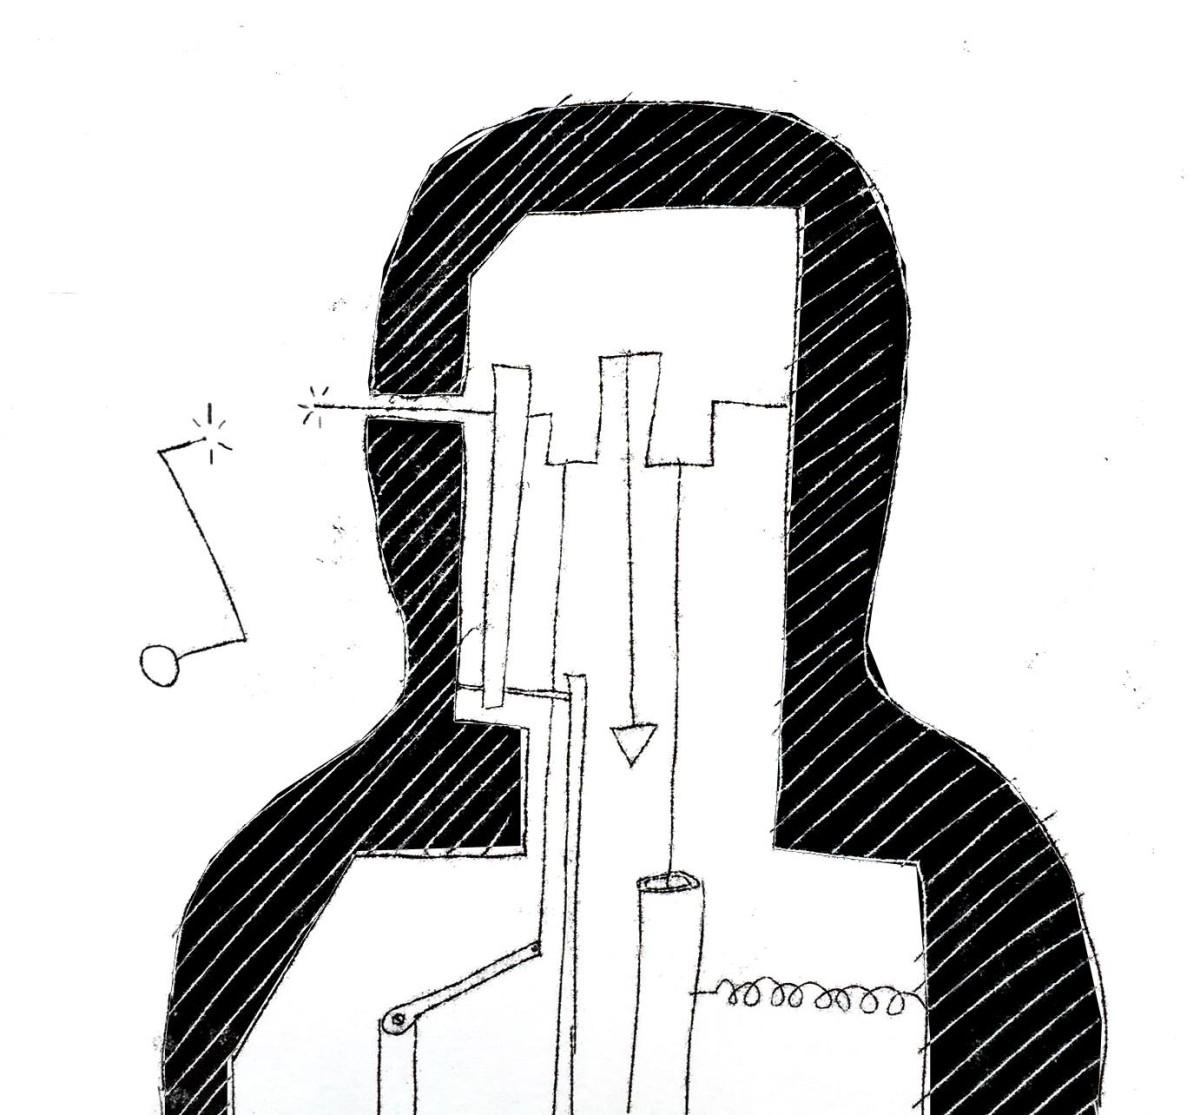 Symulator mózgowy, rys. Piotr Petarda